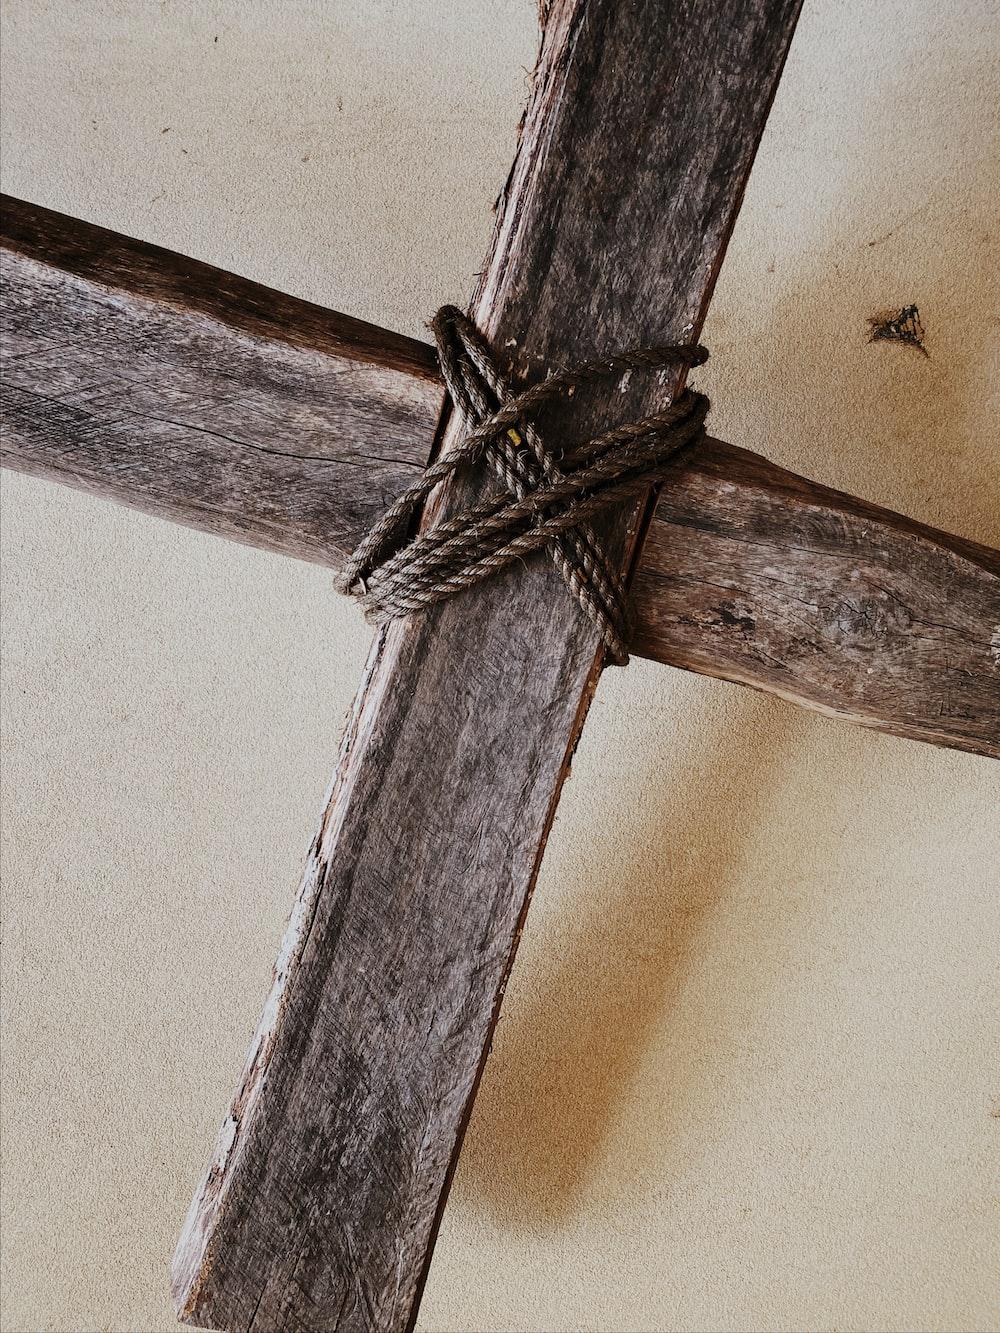 brown rope on brown wooden post